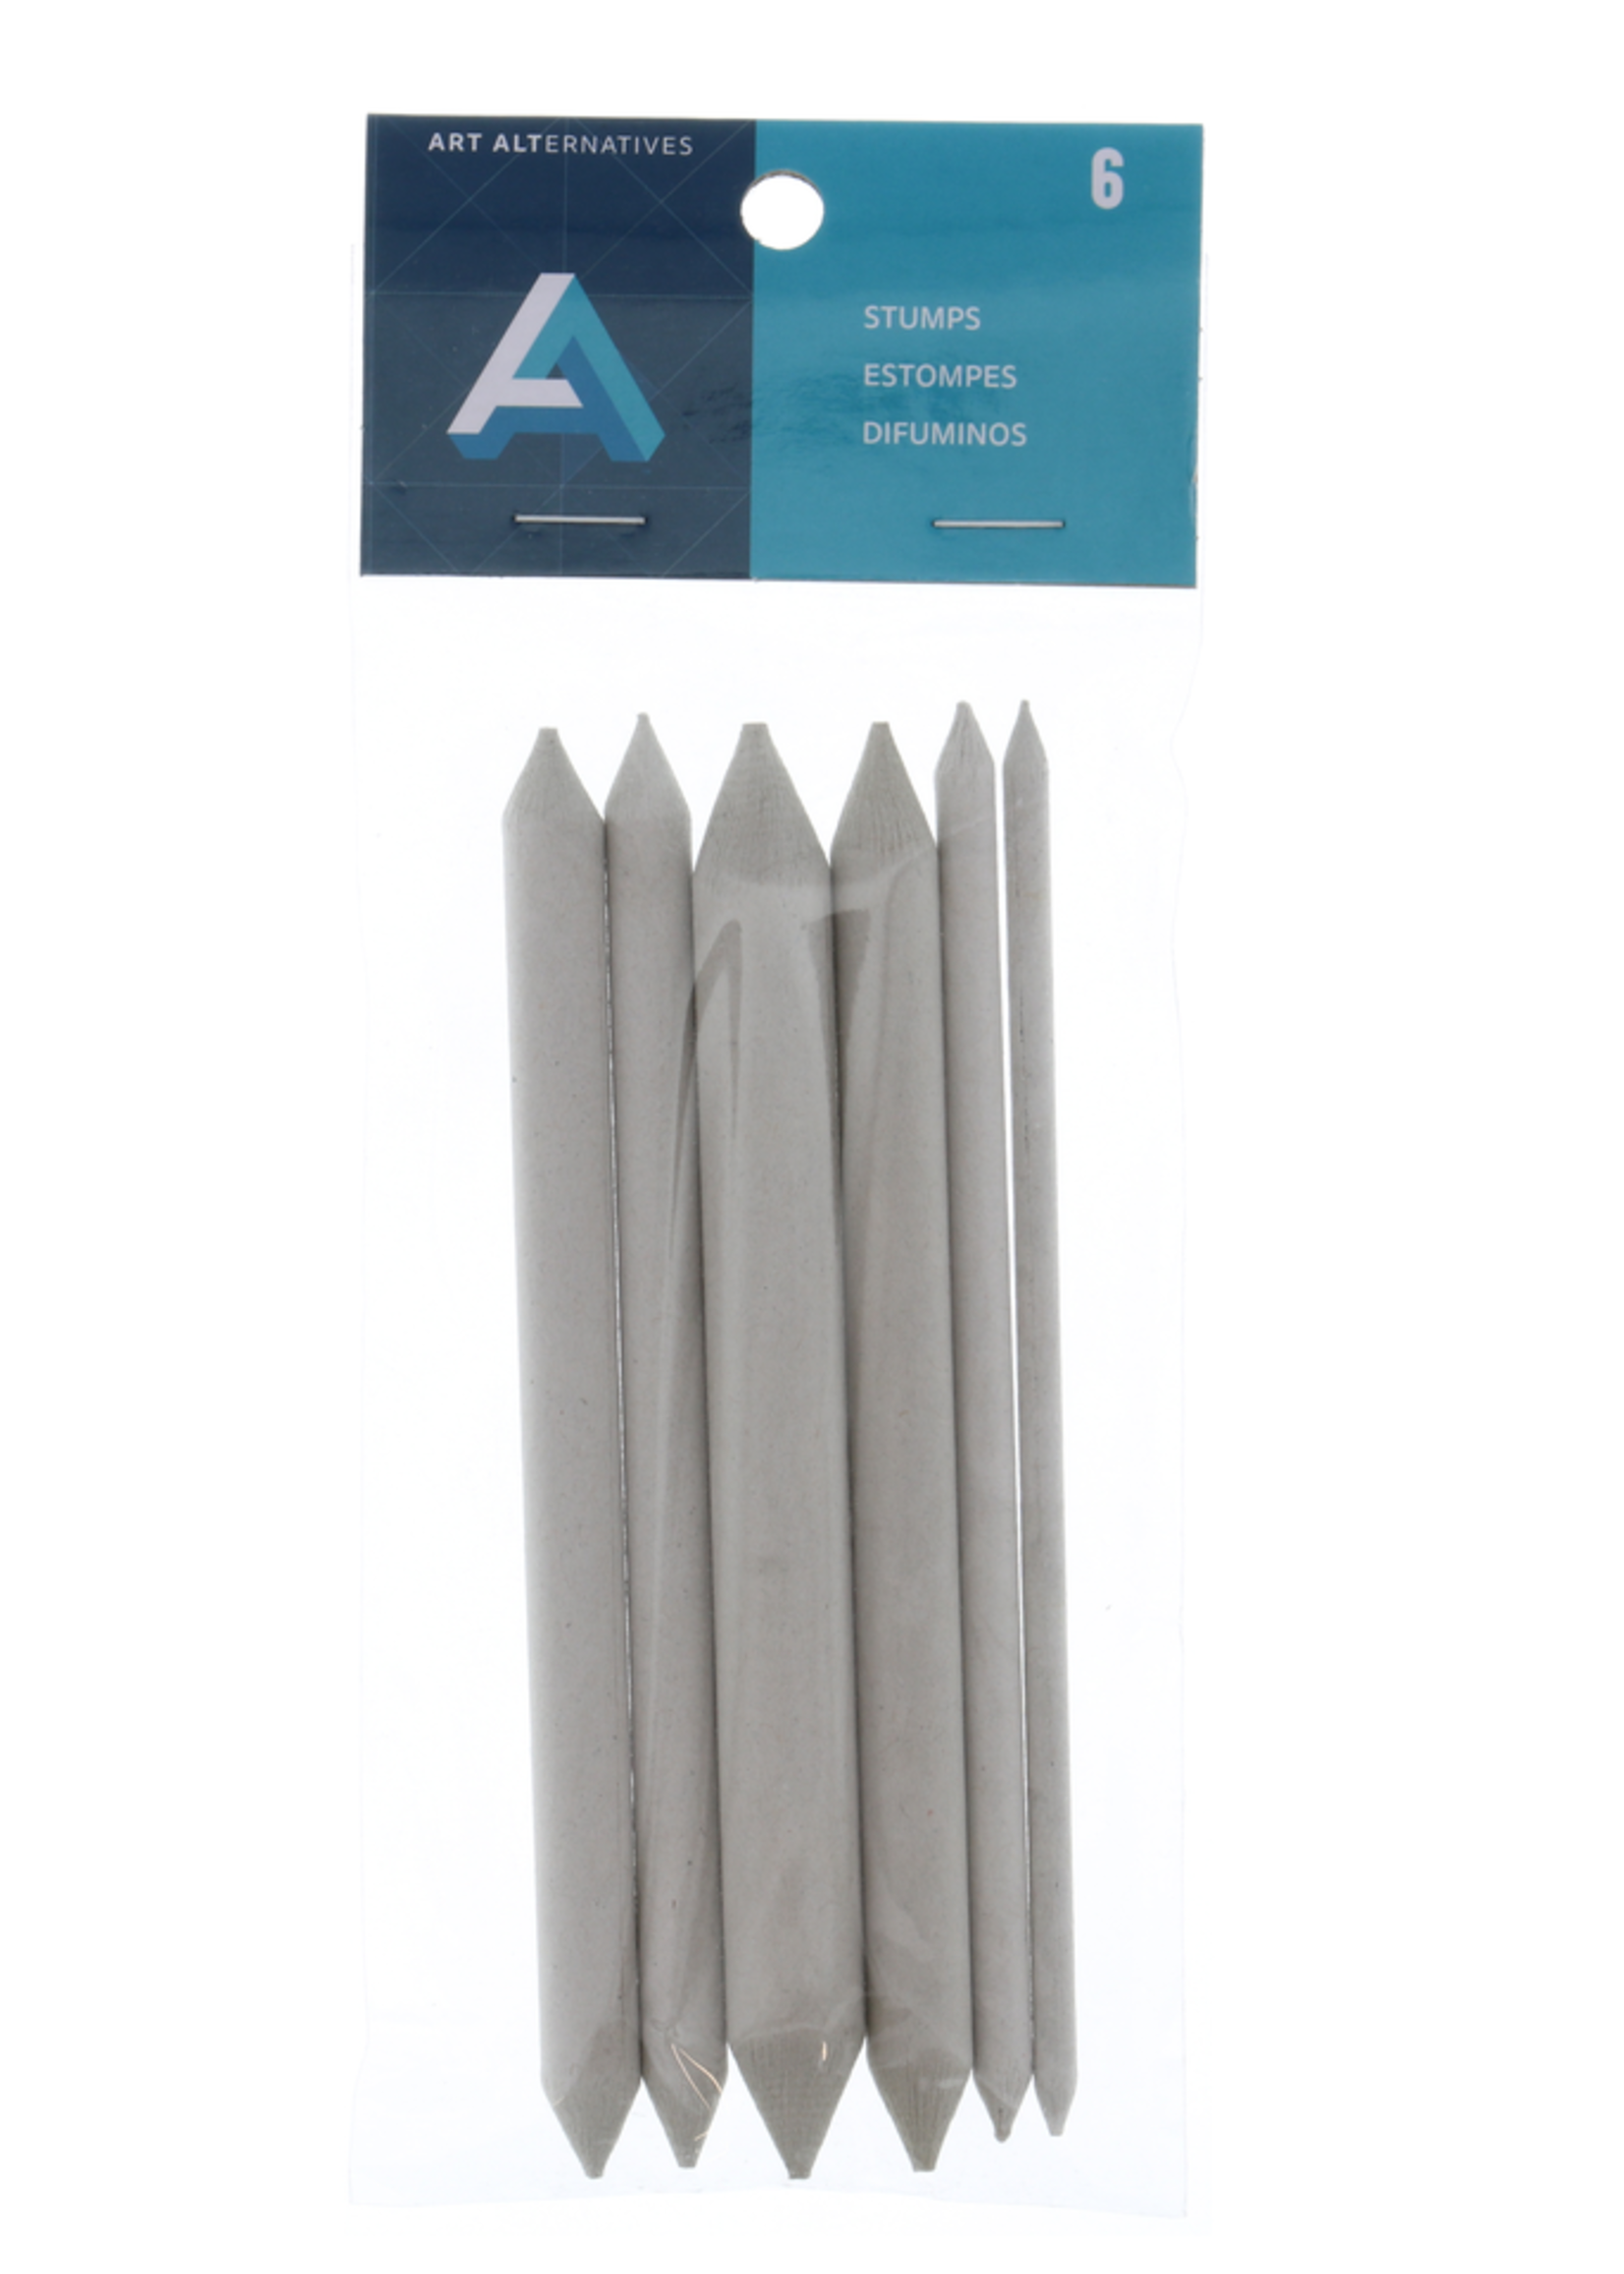 ART ALTERNATIVES AA- BLENDING STUMPS